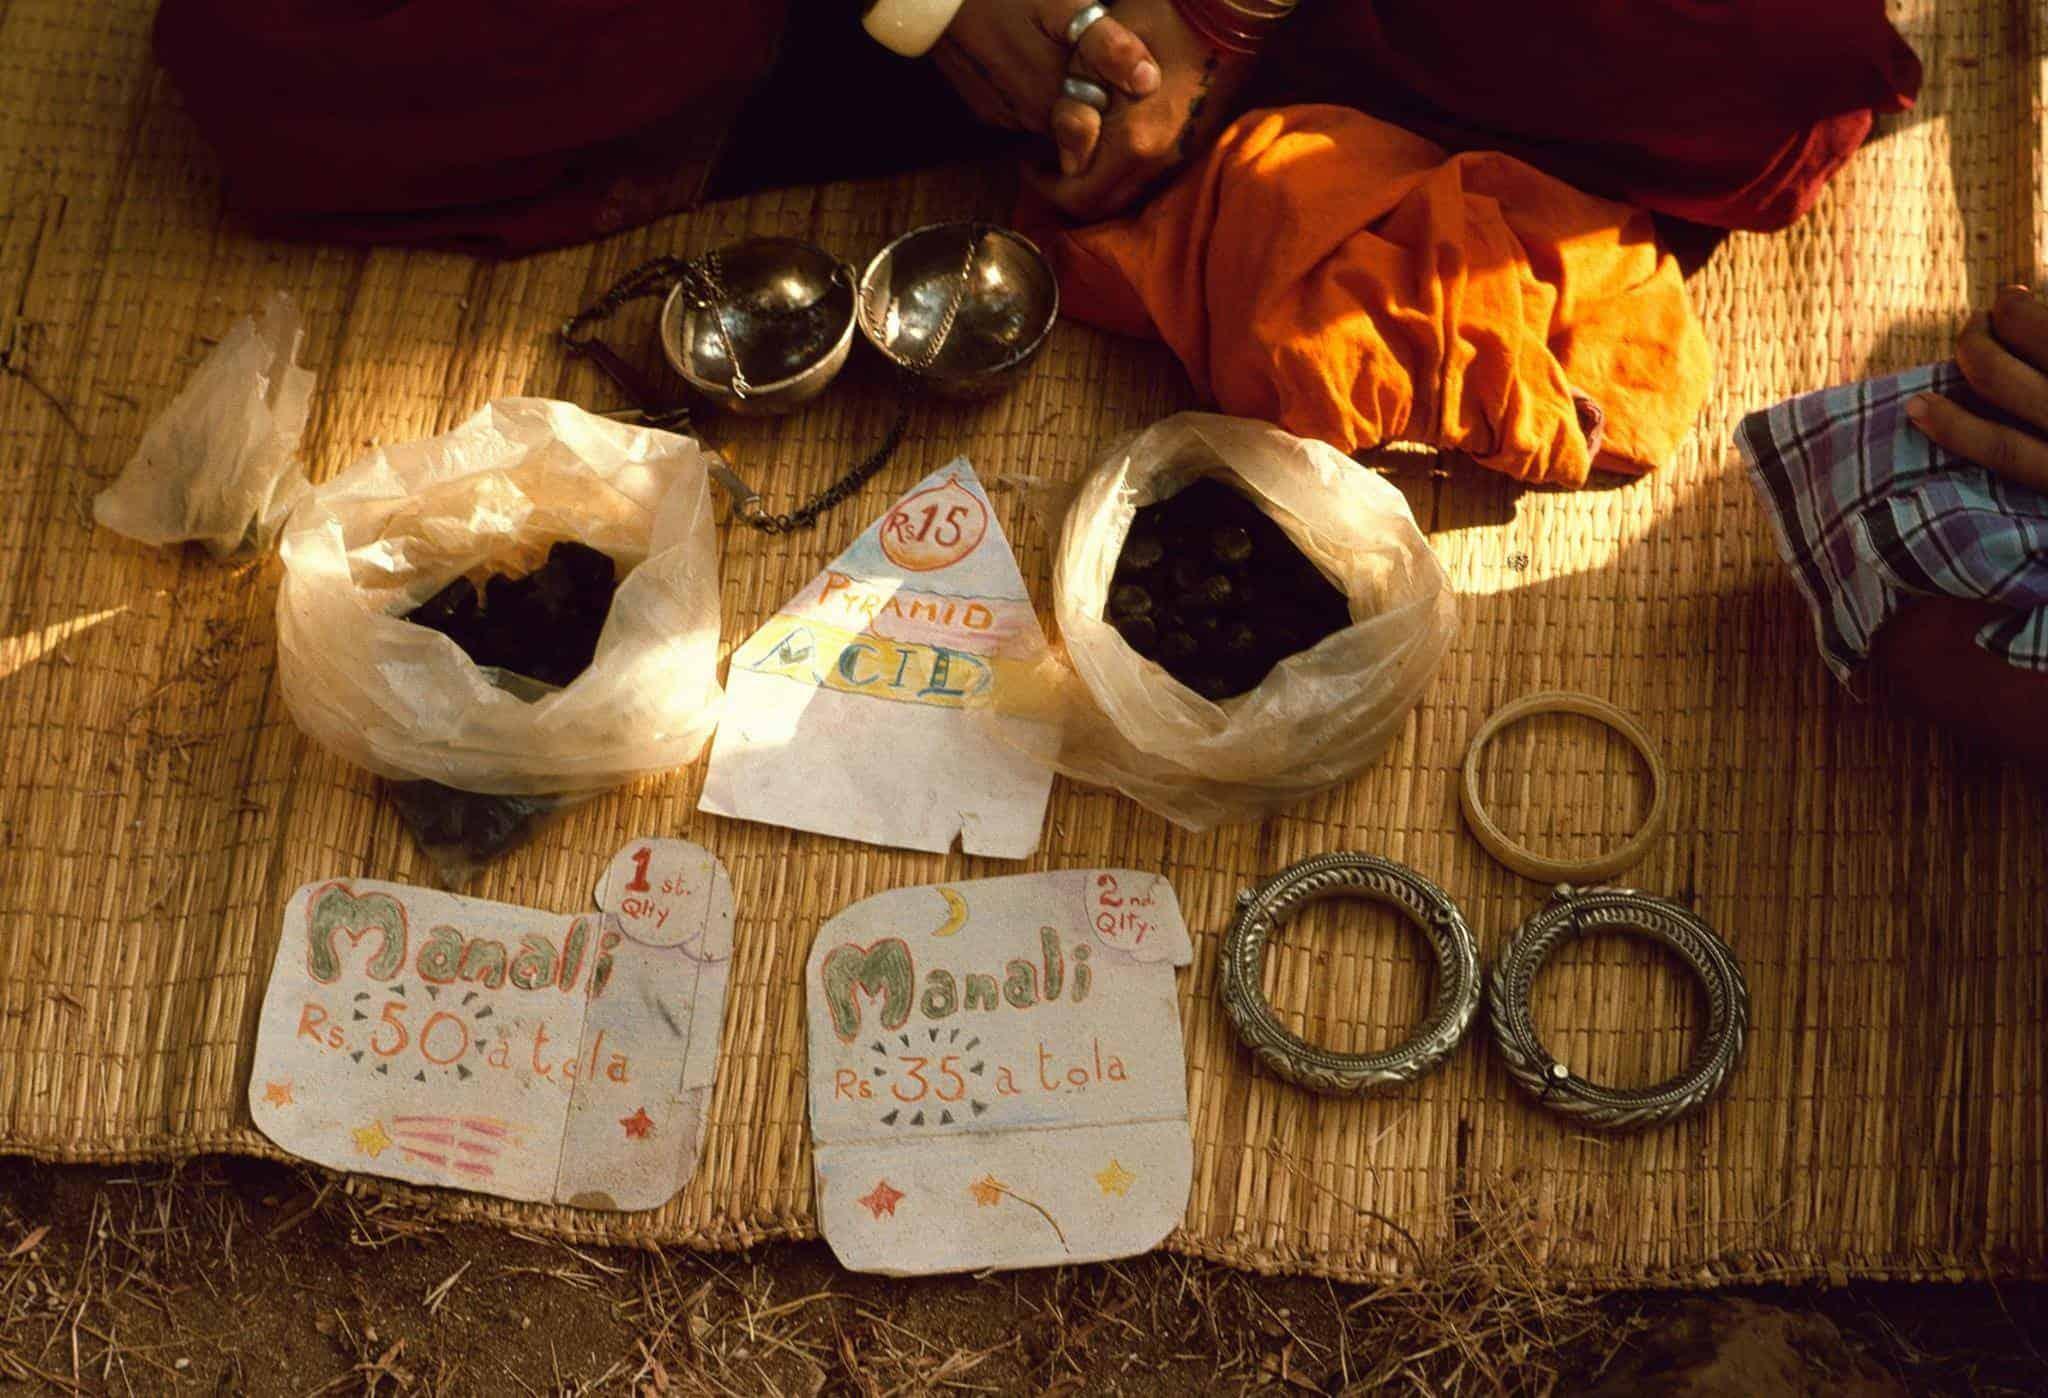 Прилавок с гашишем, ЛСД и ювелиркой на Anjuna flea market, Гоа, 1976 год (Photo by Michel Hilzinger).